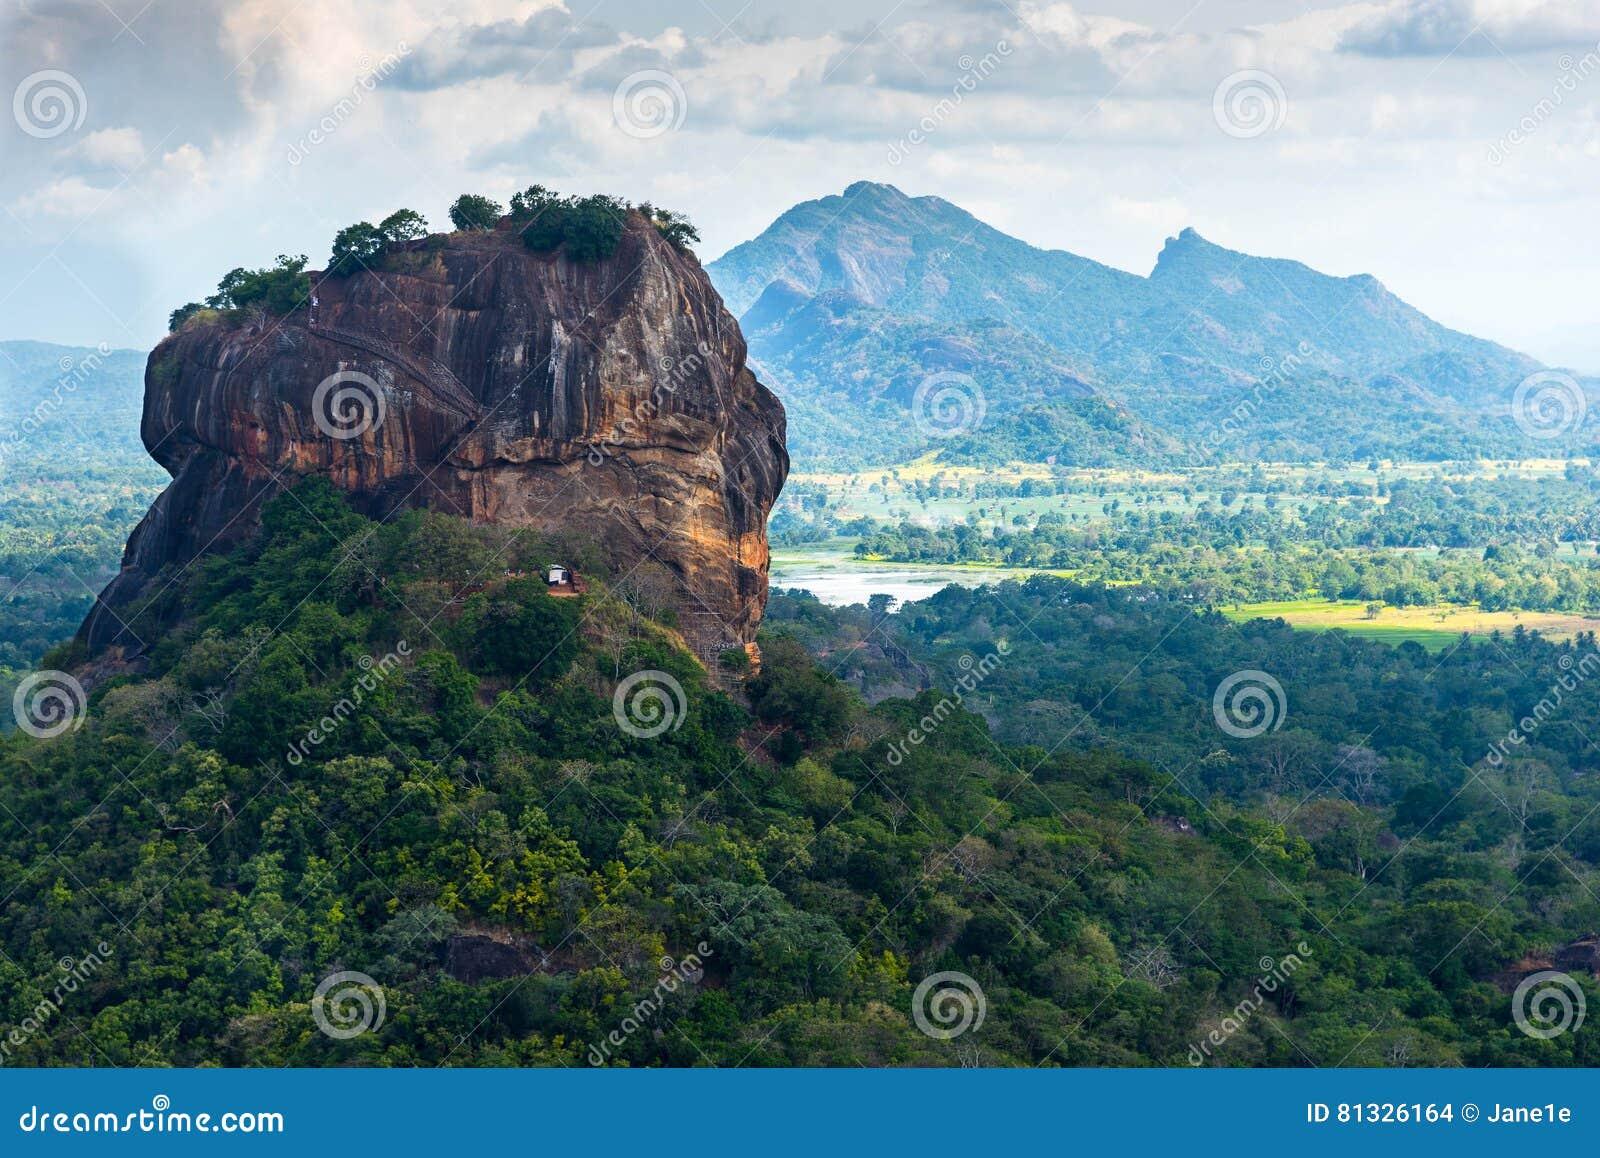 Sigiriya Lion Rock